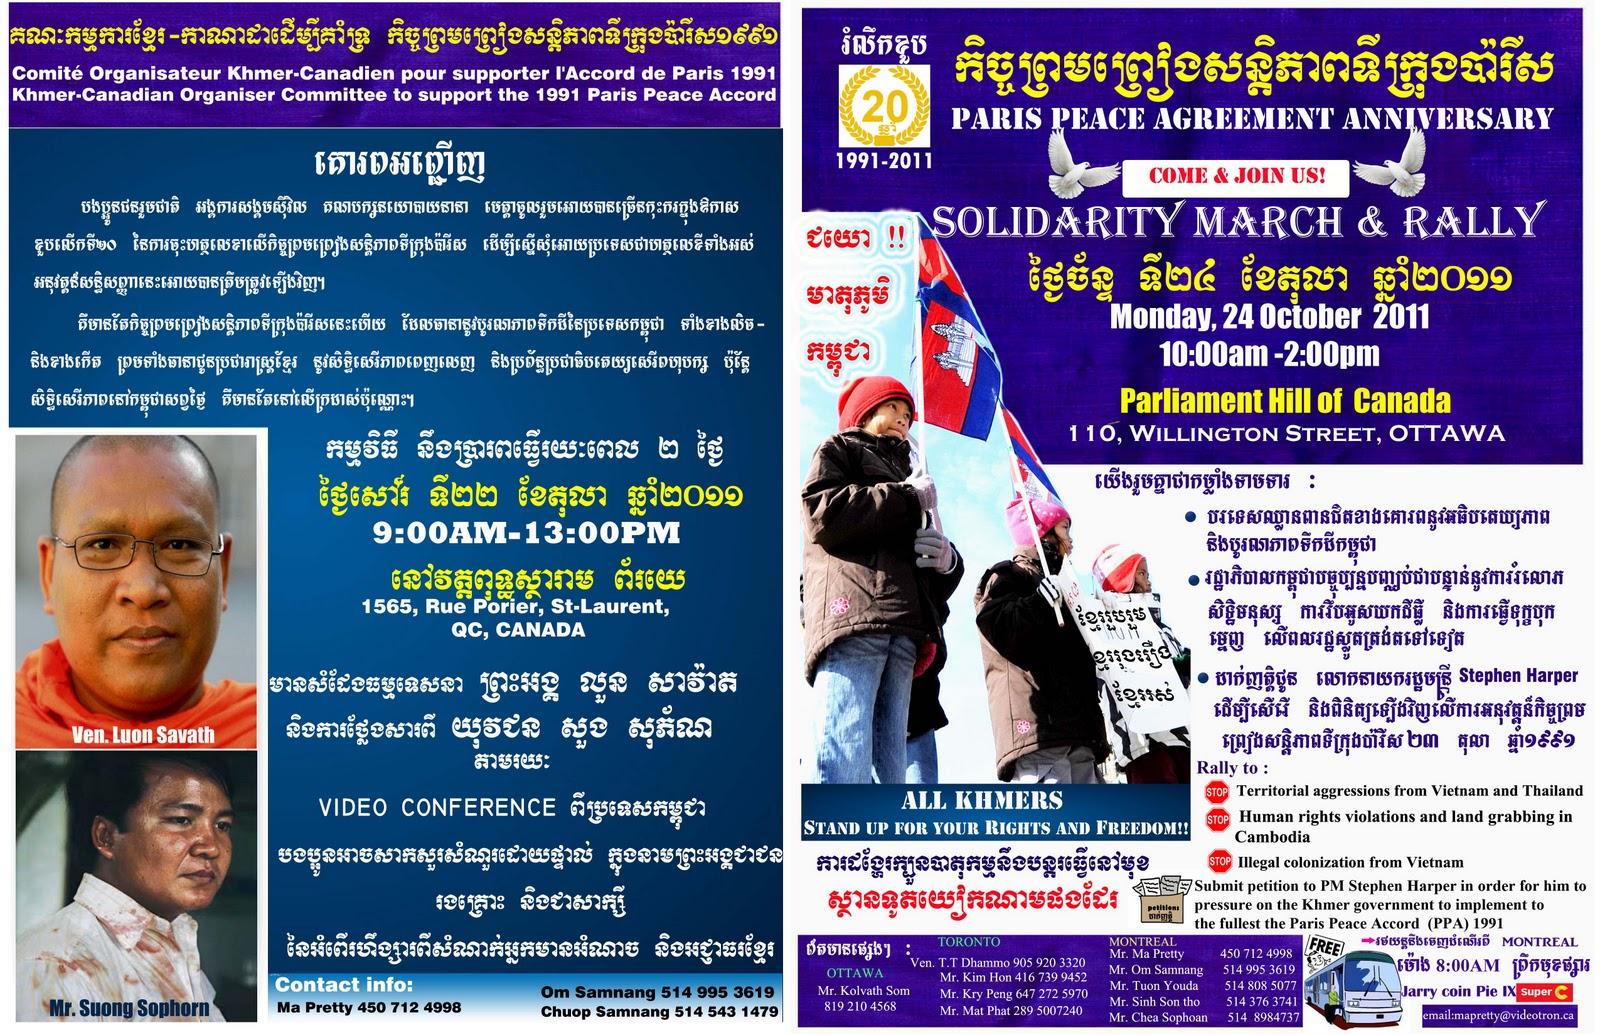 Ki Media 1991 Paris Peace Agreement Solidarity March Rally In